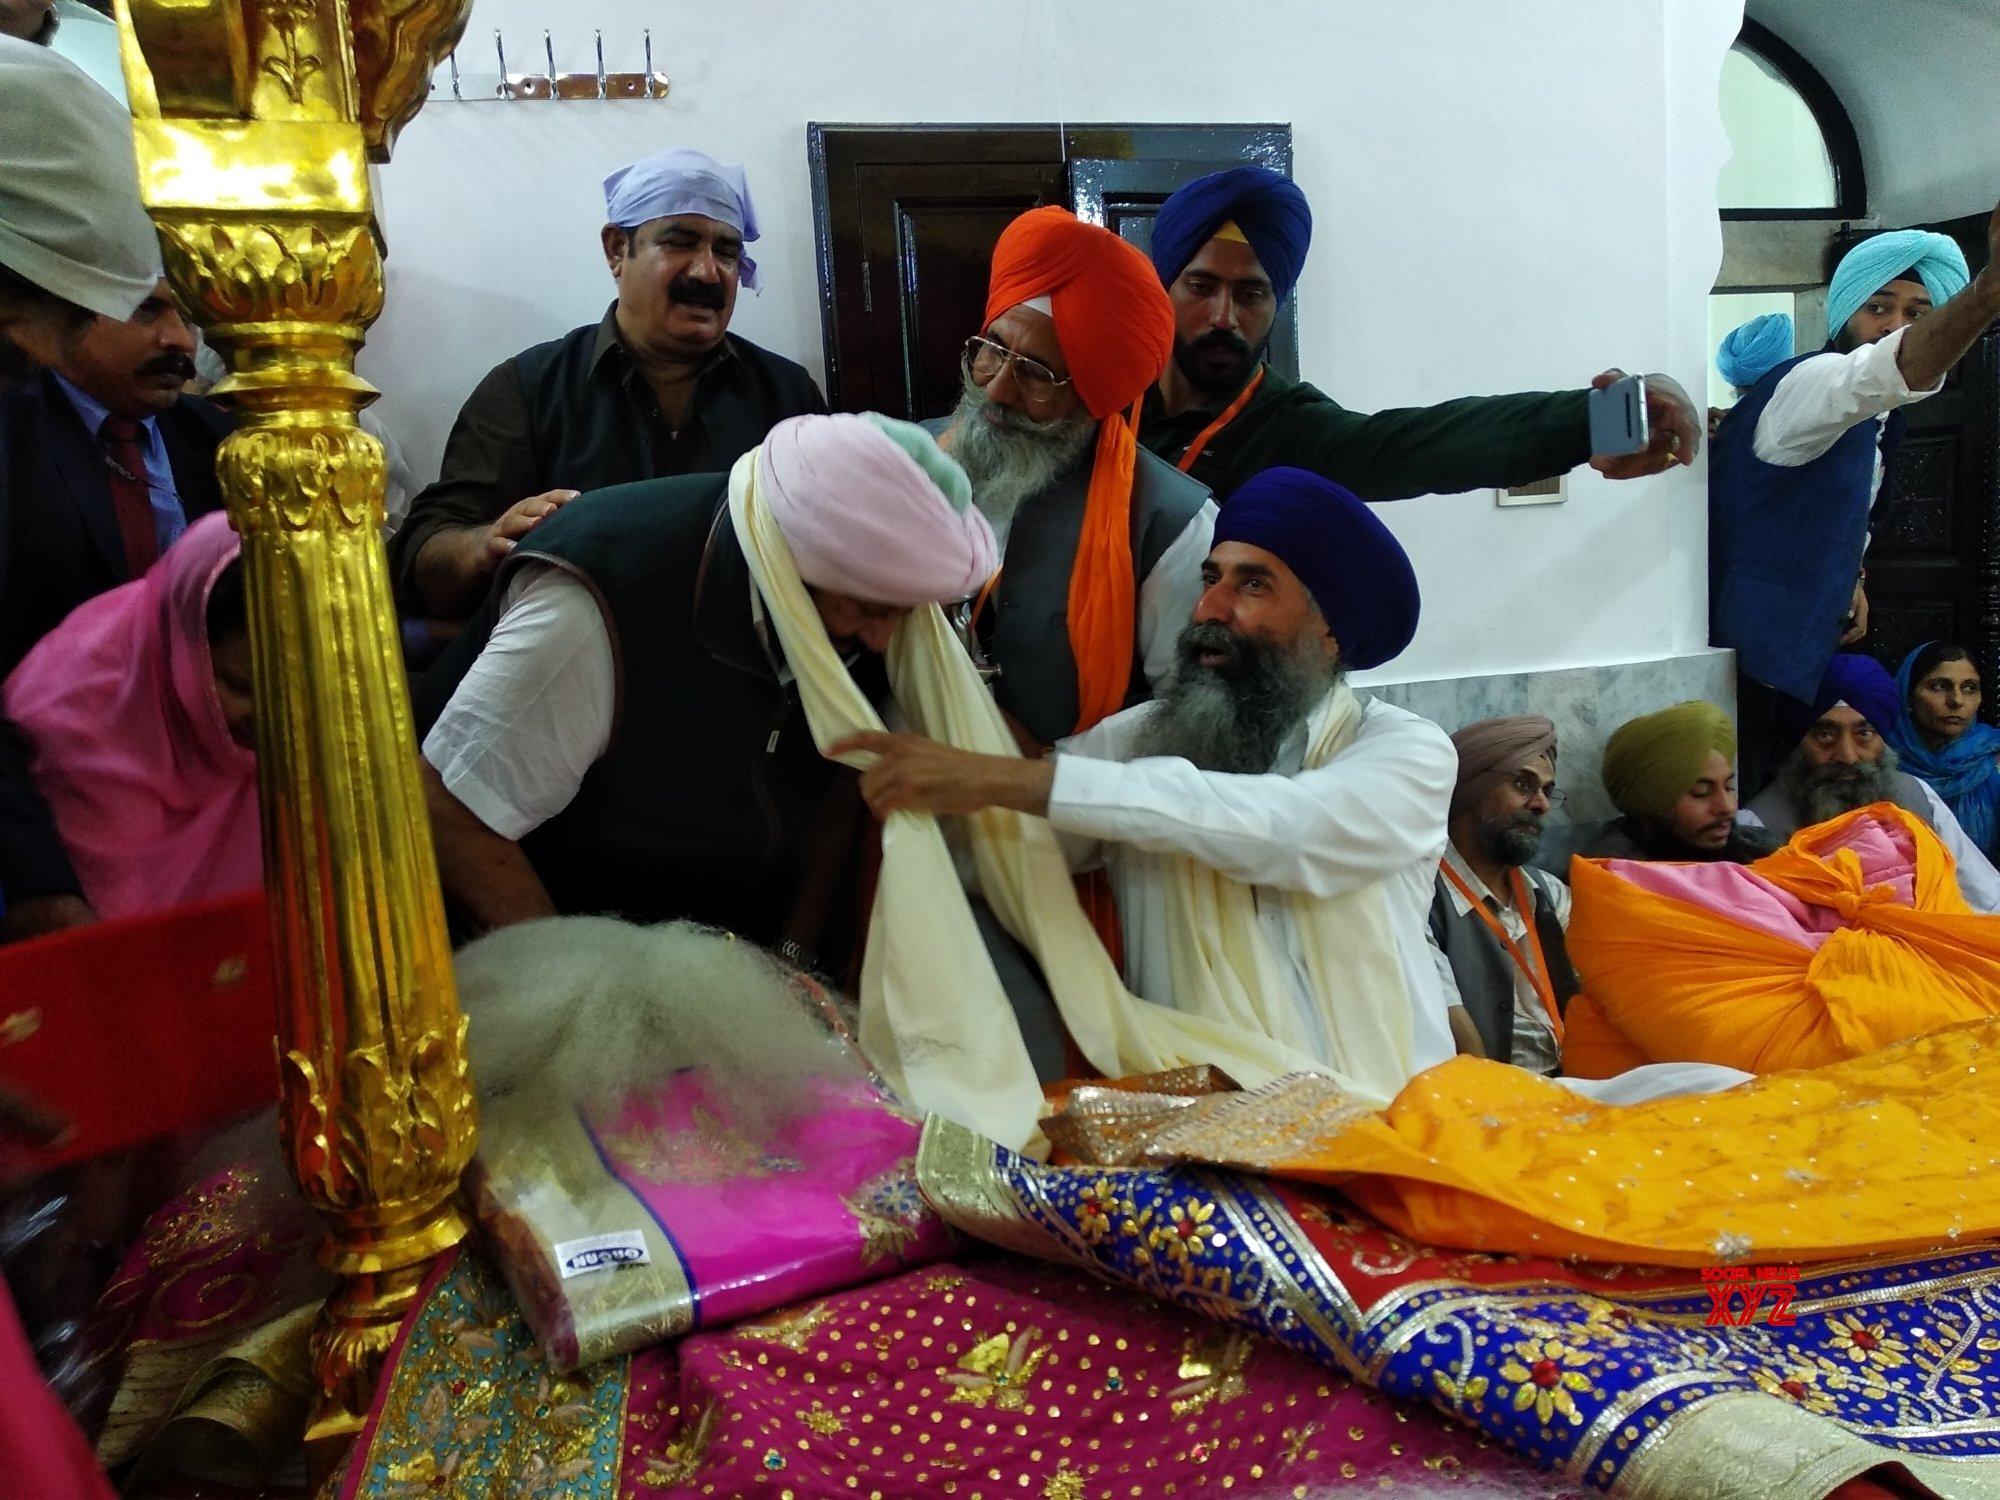 Kartarpur: Gurdwara Darbar Sahib - Amarinder Singh #Gallery